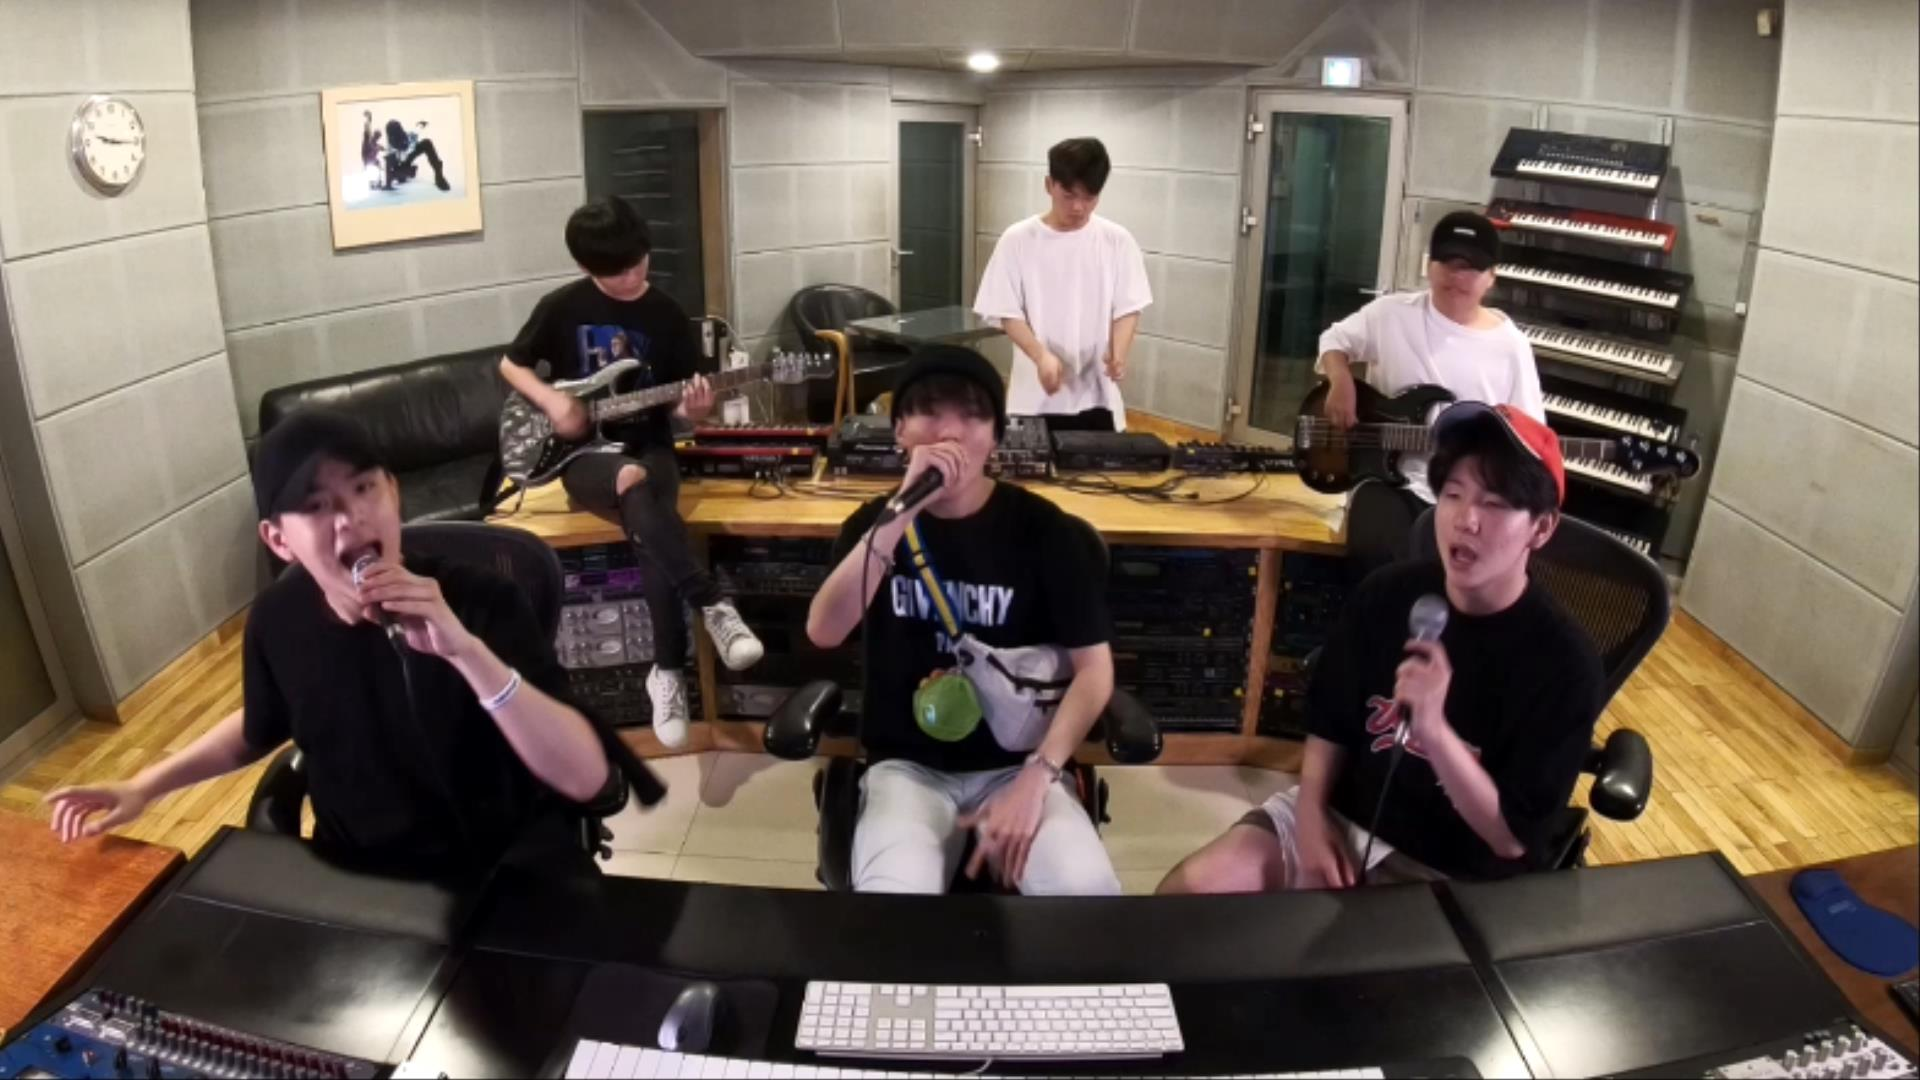 TheEastLight.(더 이스트라이트) - 자존감 치트기 송 메들리 (Self-esteem Cheat Key Kpop Medley)